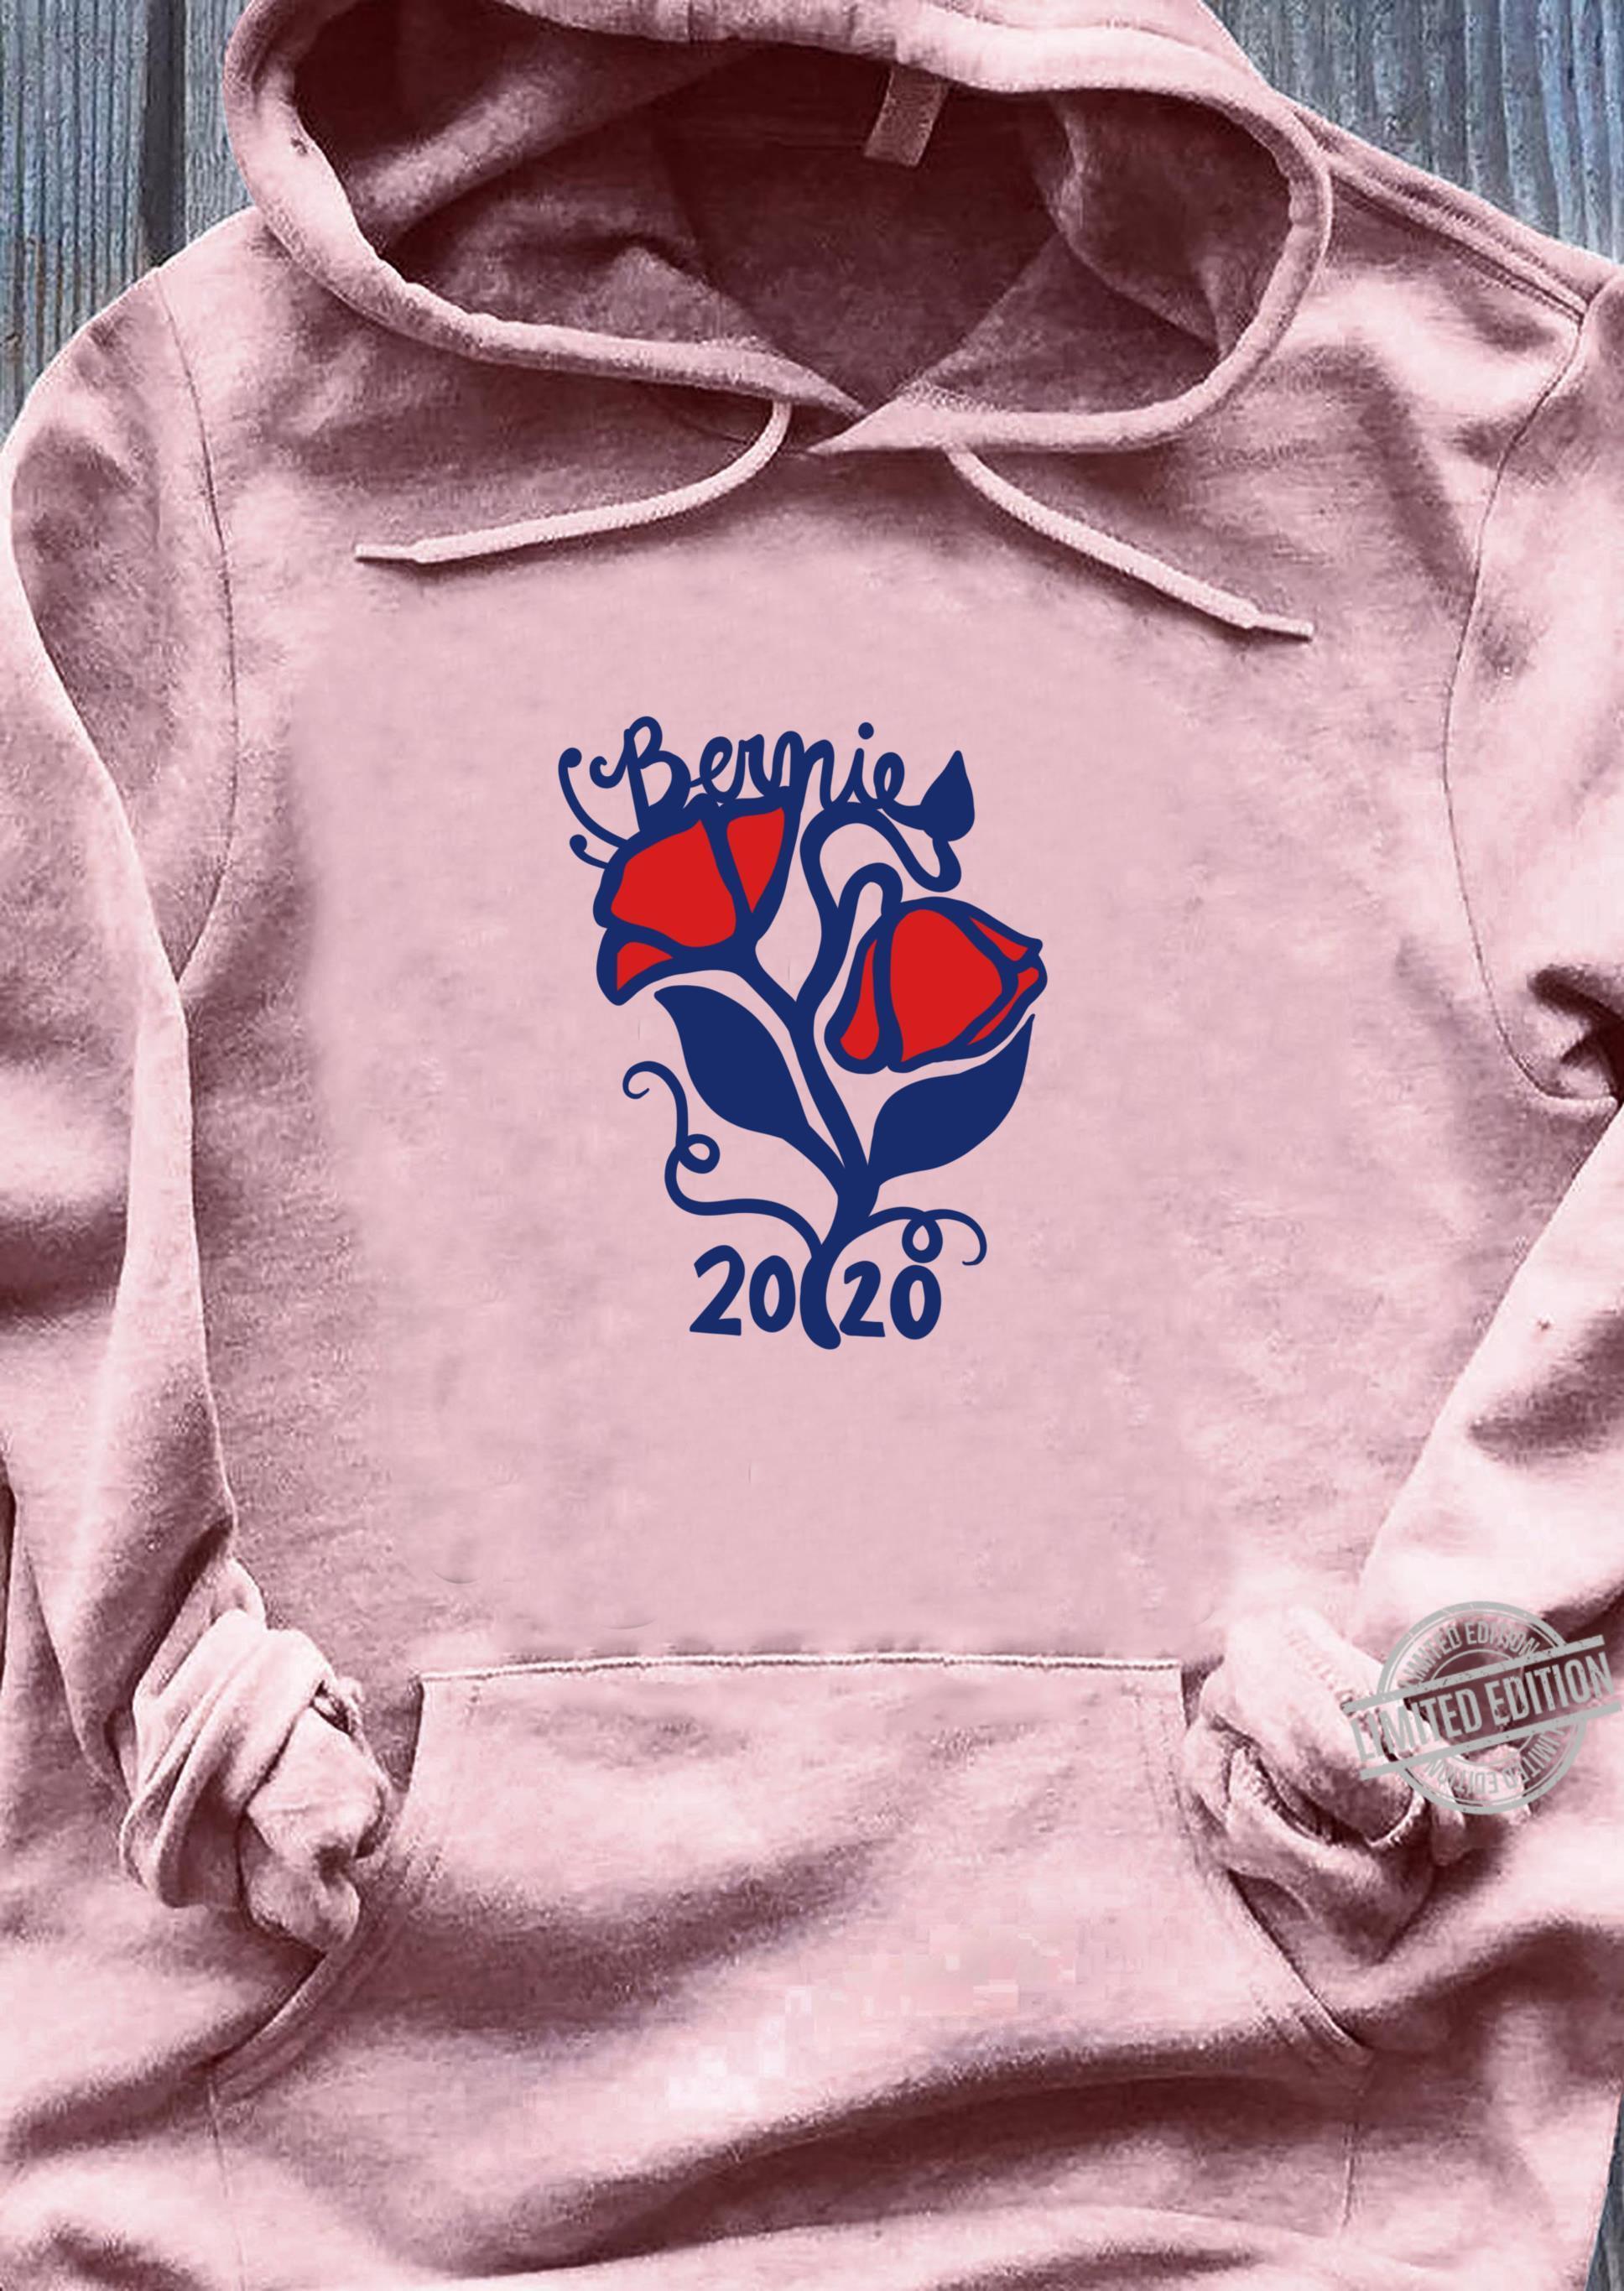 Bernie 2020 retro Bernie Sanders for president bernie 2020 Shirt ladies tee